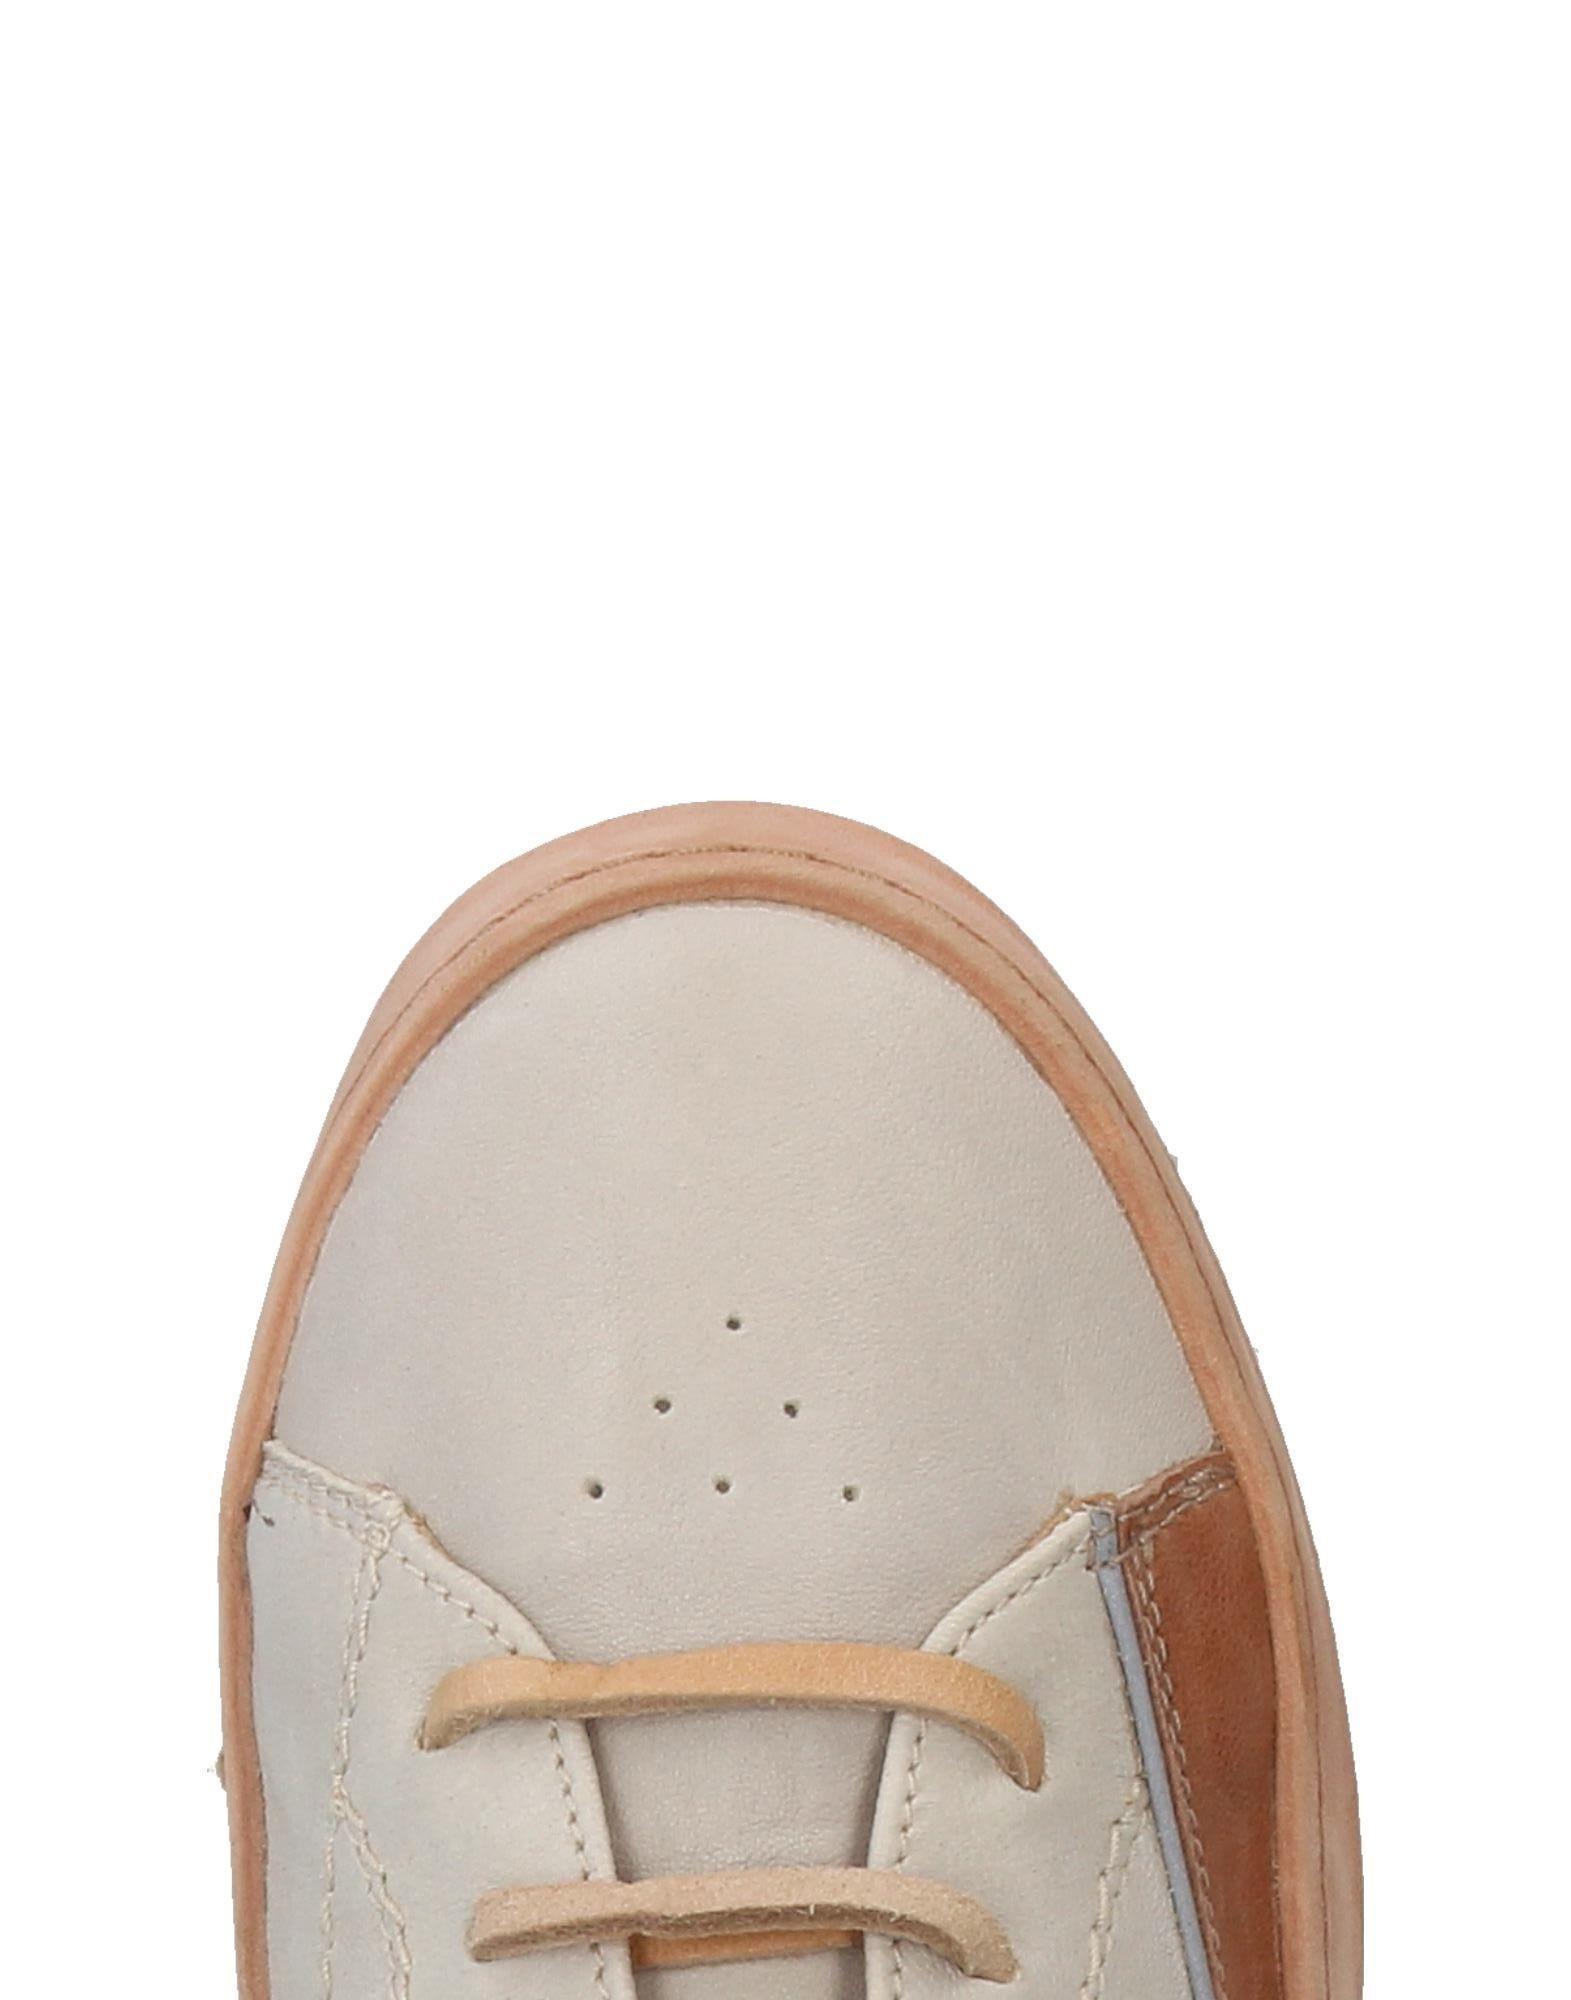 Smith's Schuhe American Sneakers Herren  11399206XL Neue Schuhe Smith's cdf08a